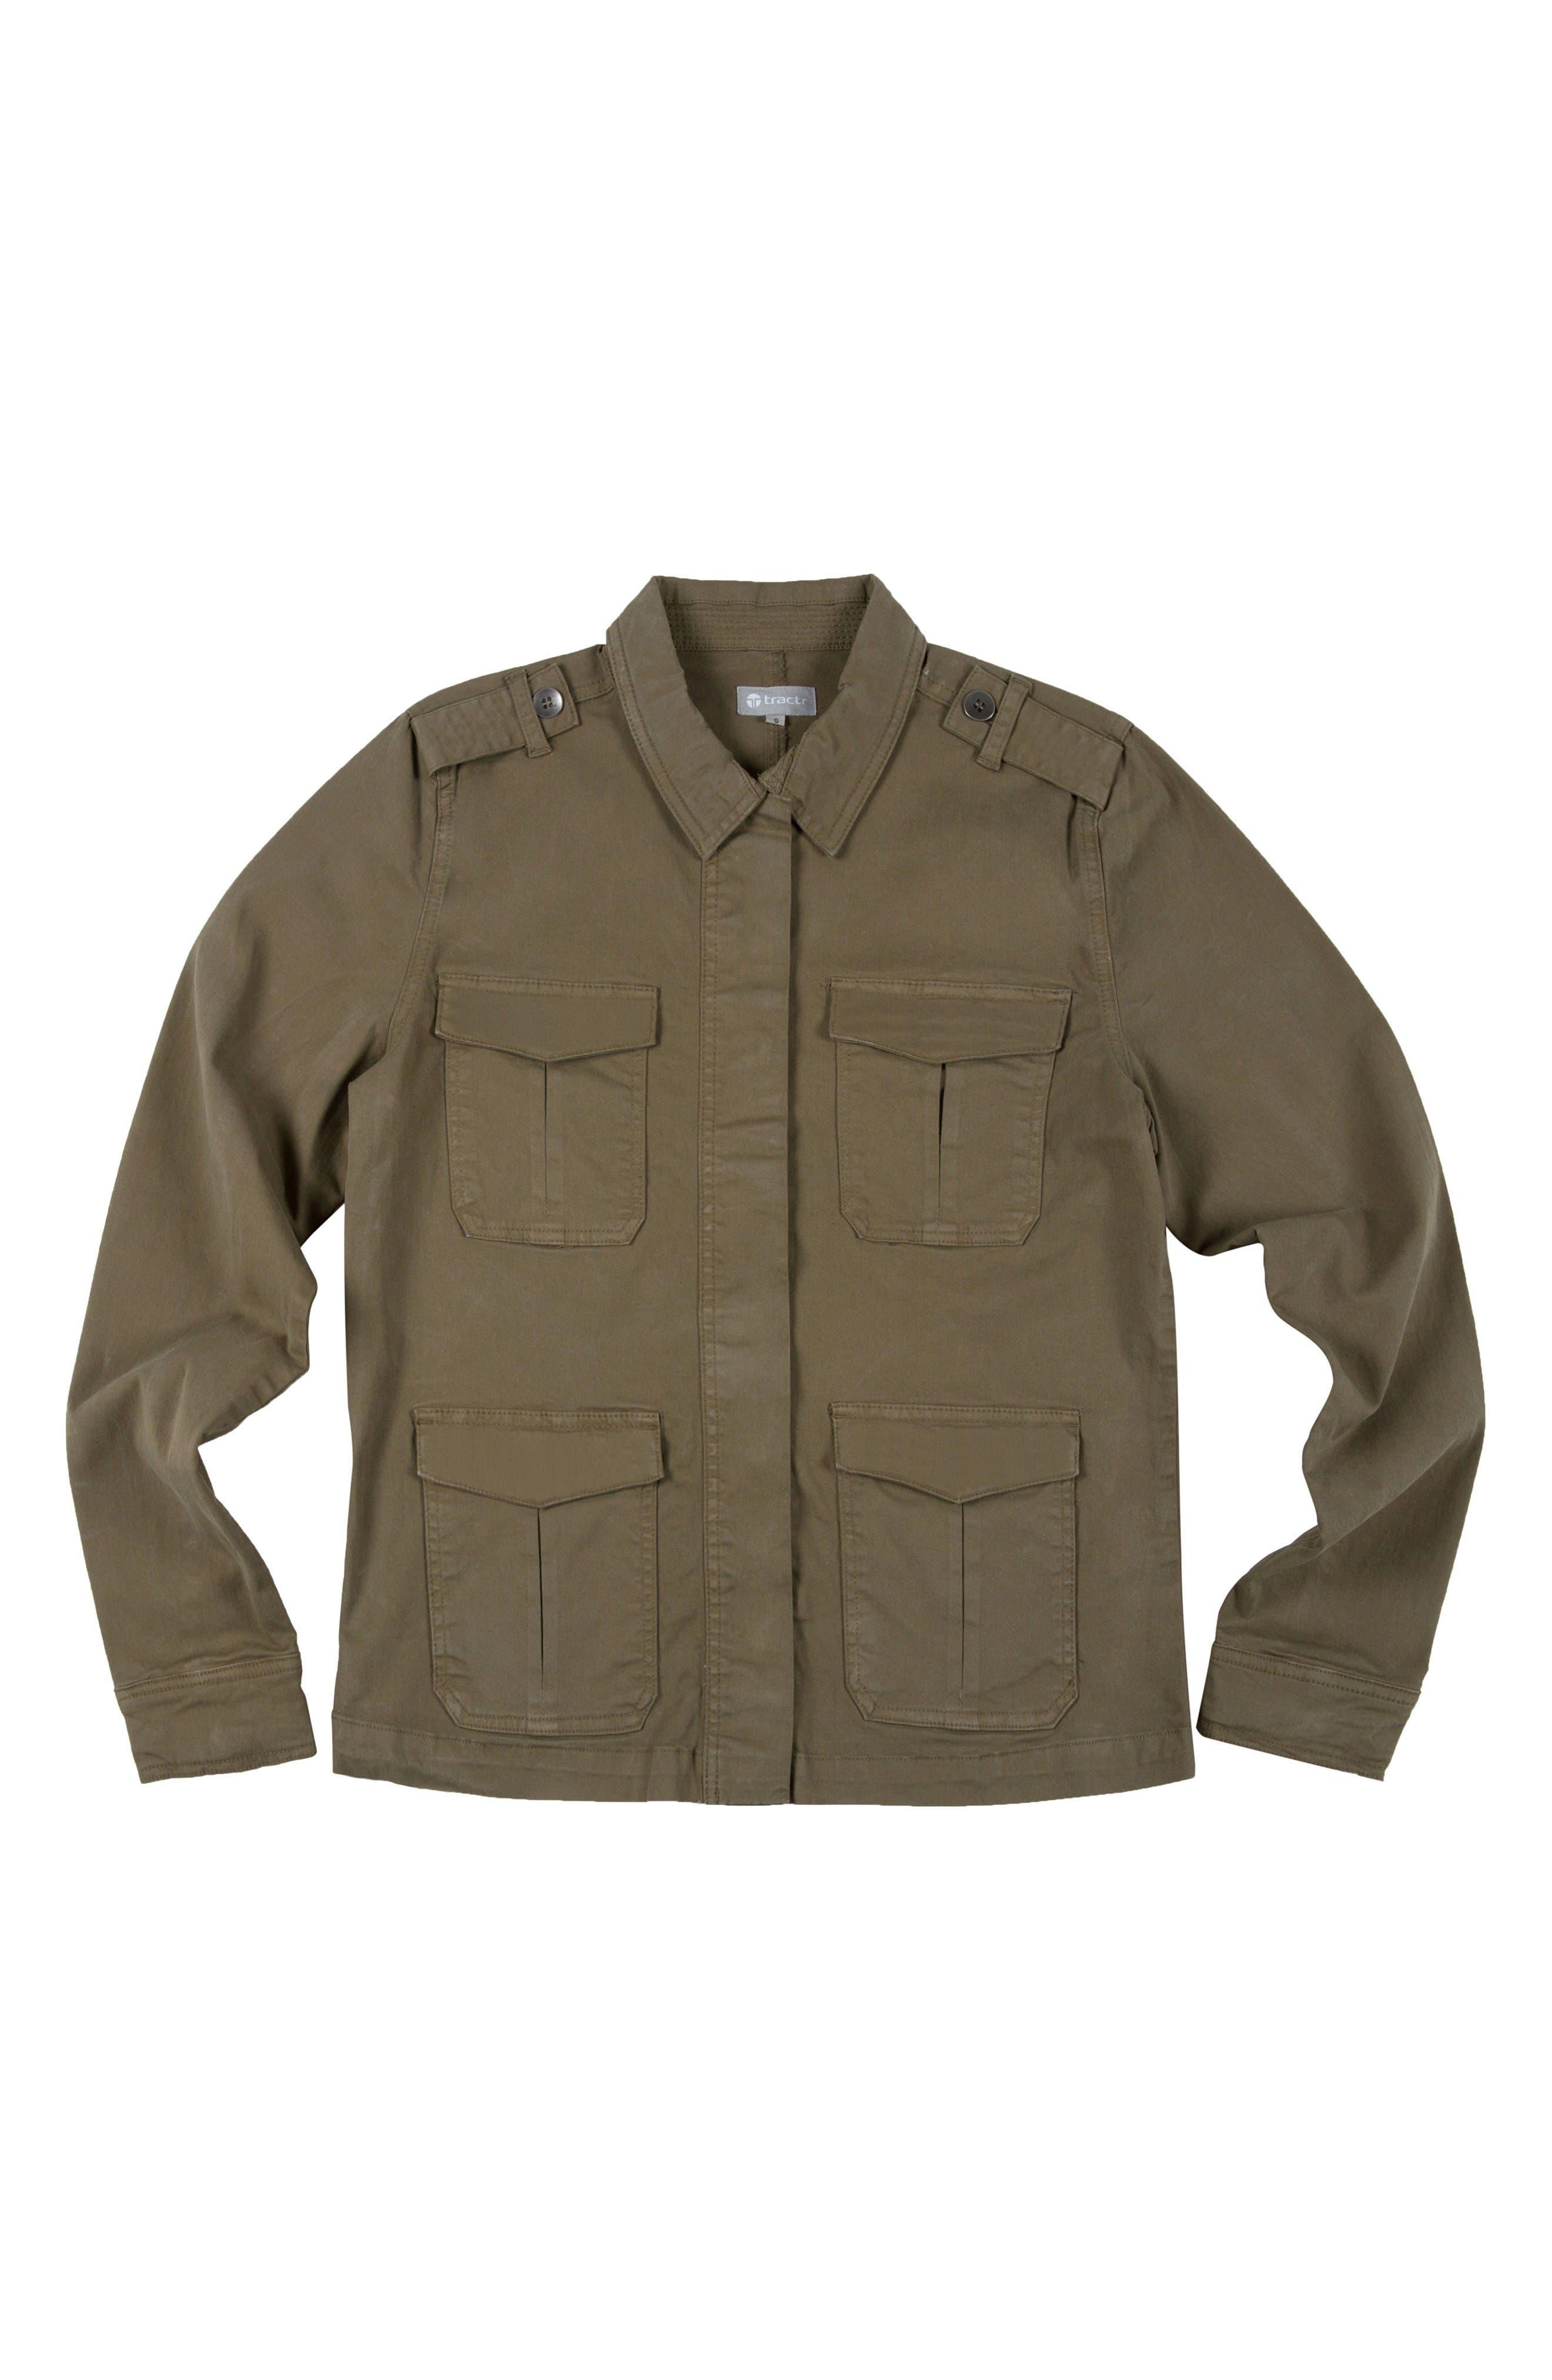 Tractr Field Jacket (Big Girls)